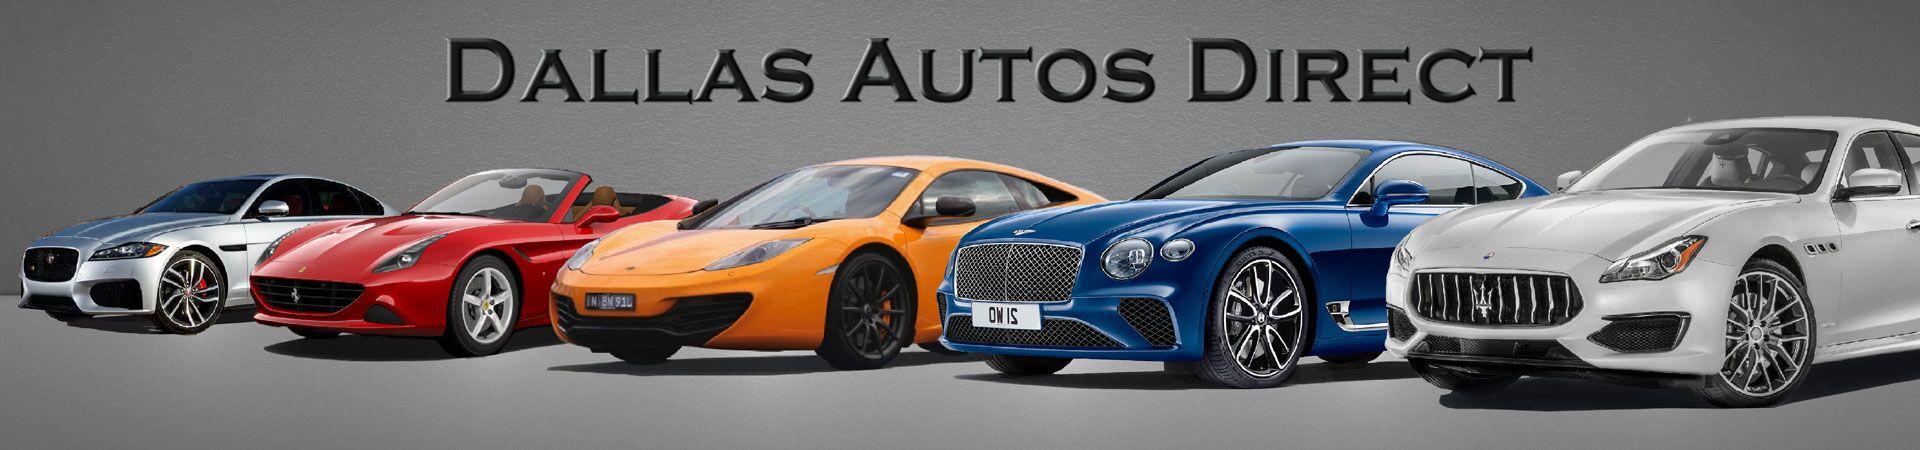 Used Car Dealership Carrollton TX | Dallas Autos Direct